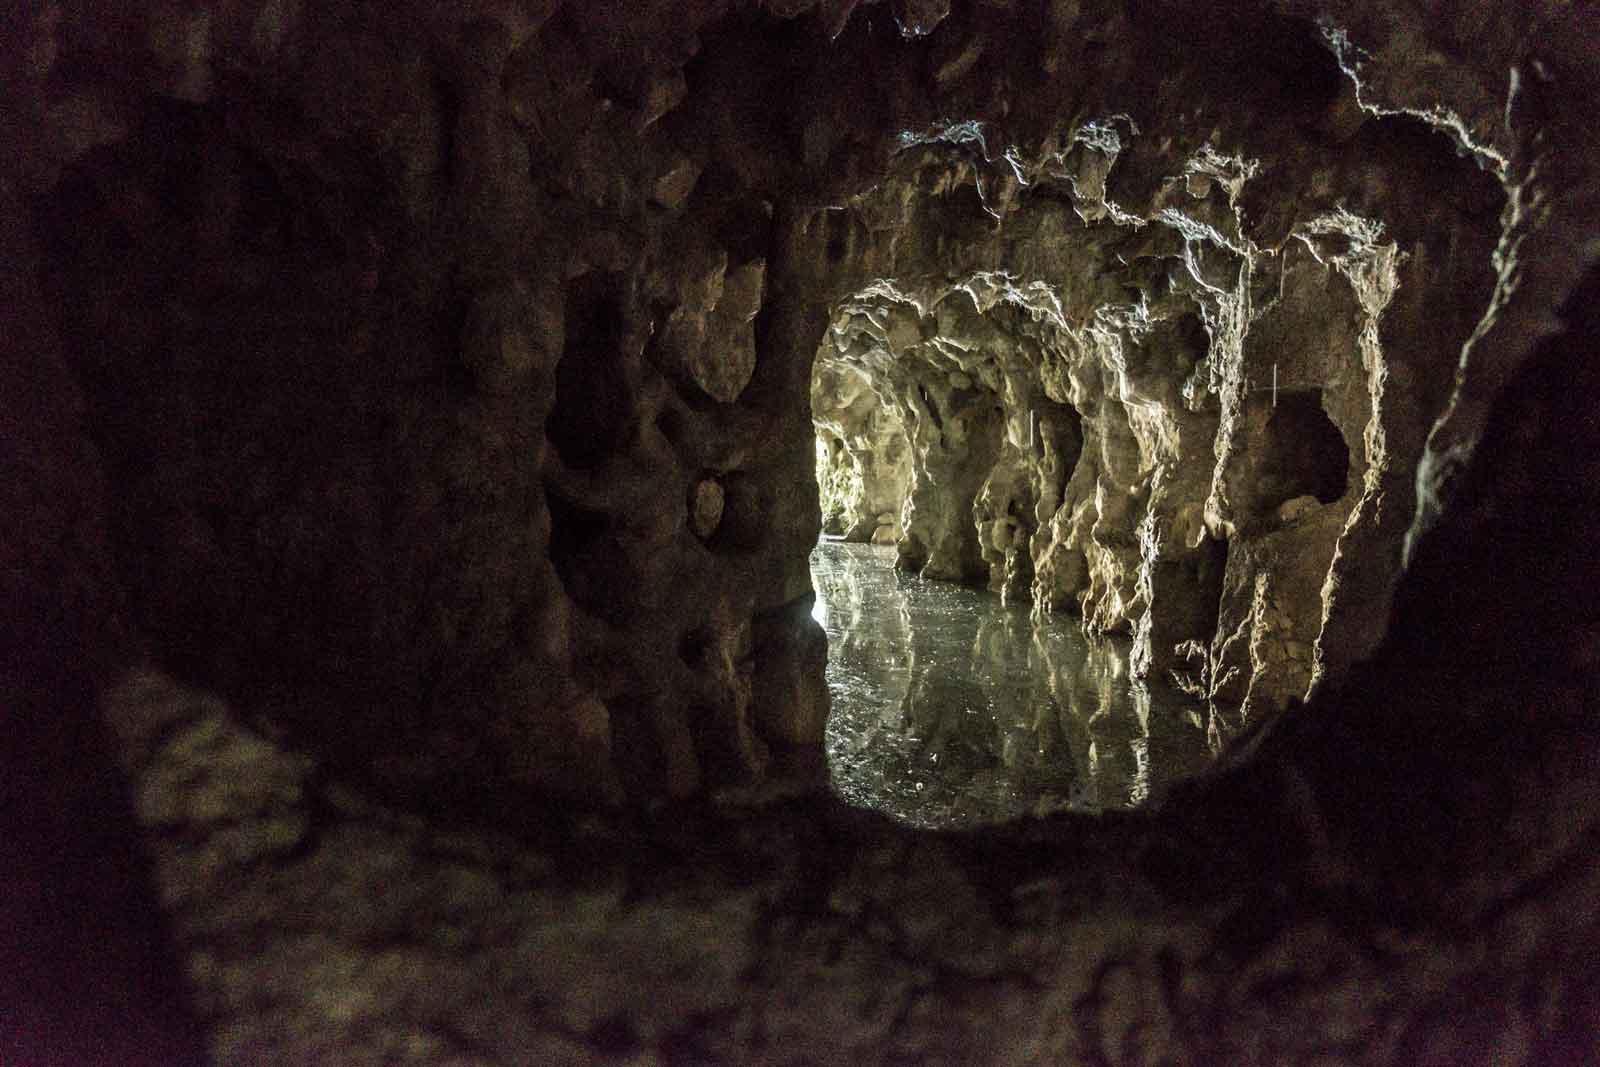 Sintra-Teil-2-quinta-regaleira-Grotte-trekkinglife-06